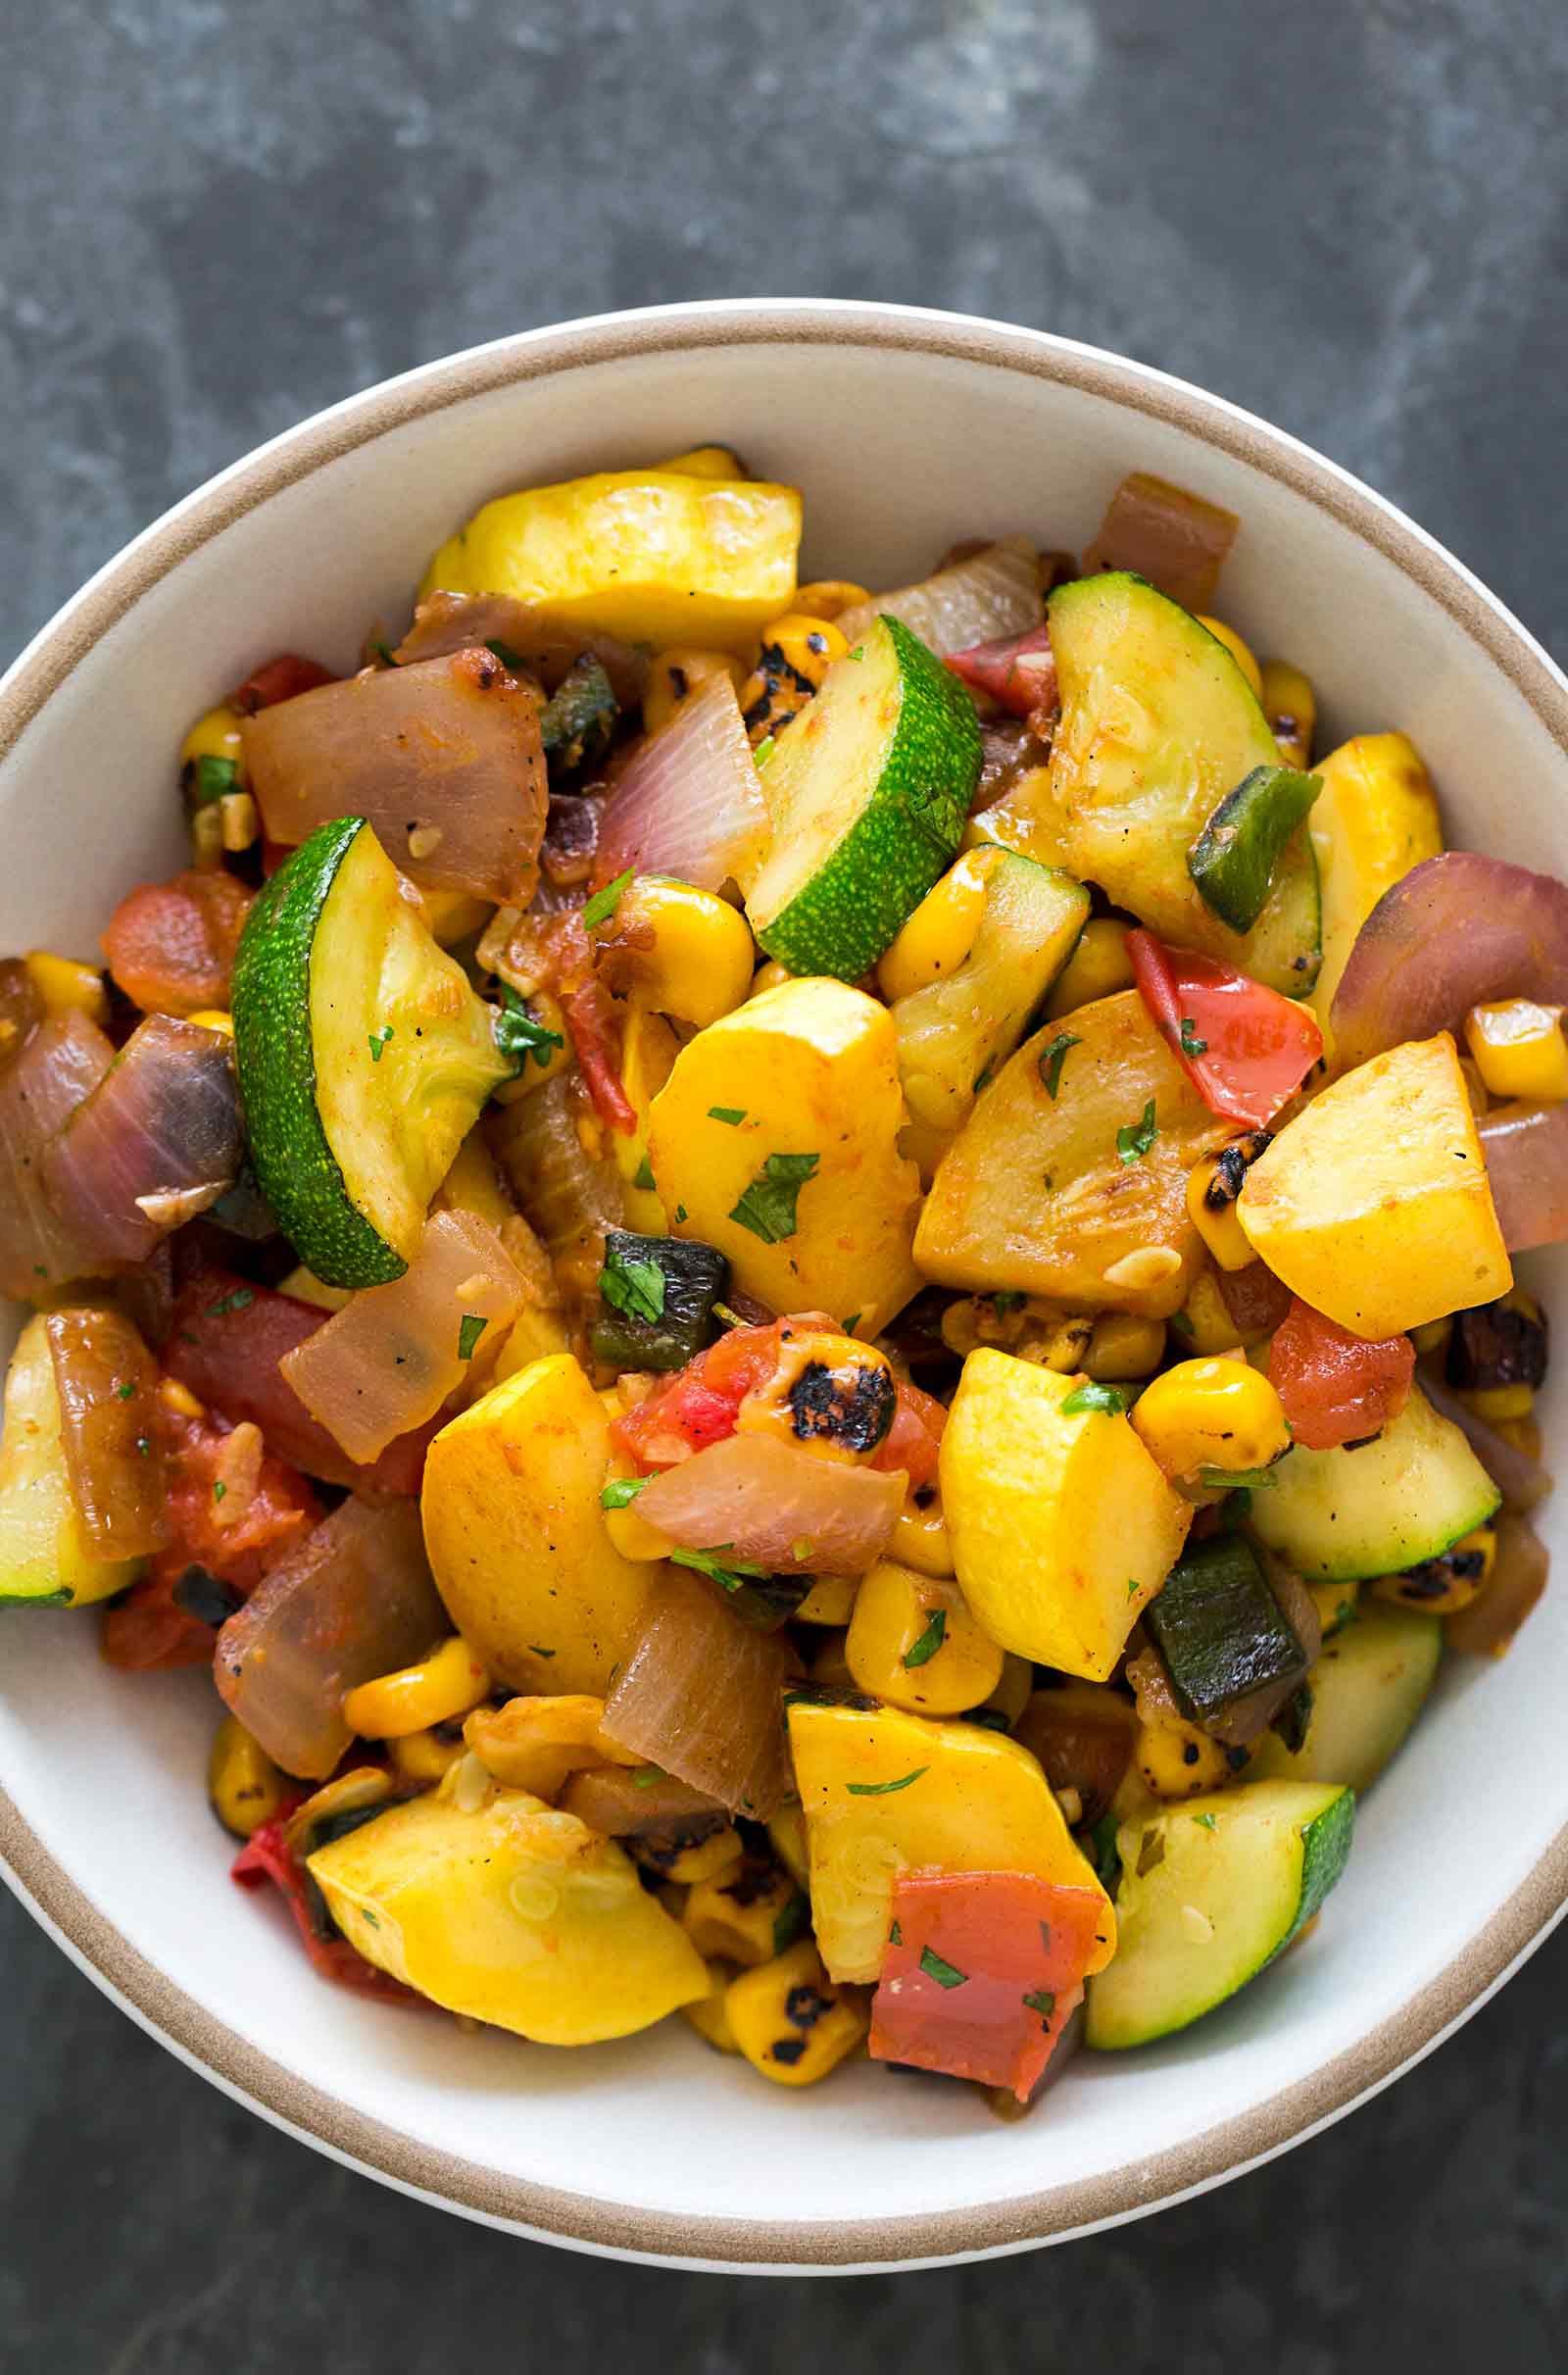 Easy Summer Vegetarian Recipes  Summer Squash Green Chile Stir Fry Recipe